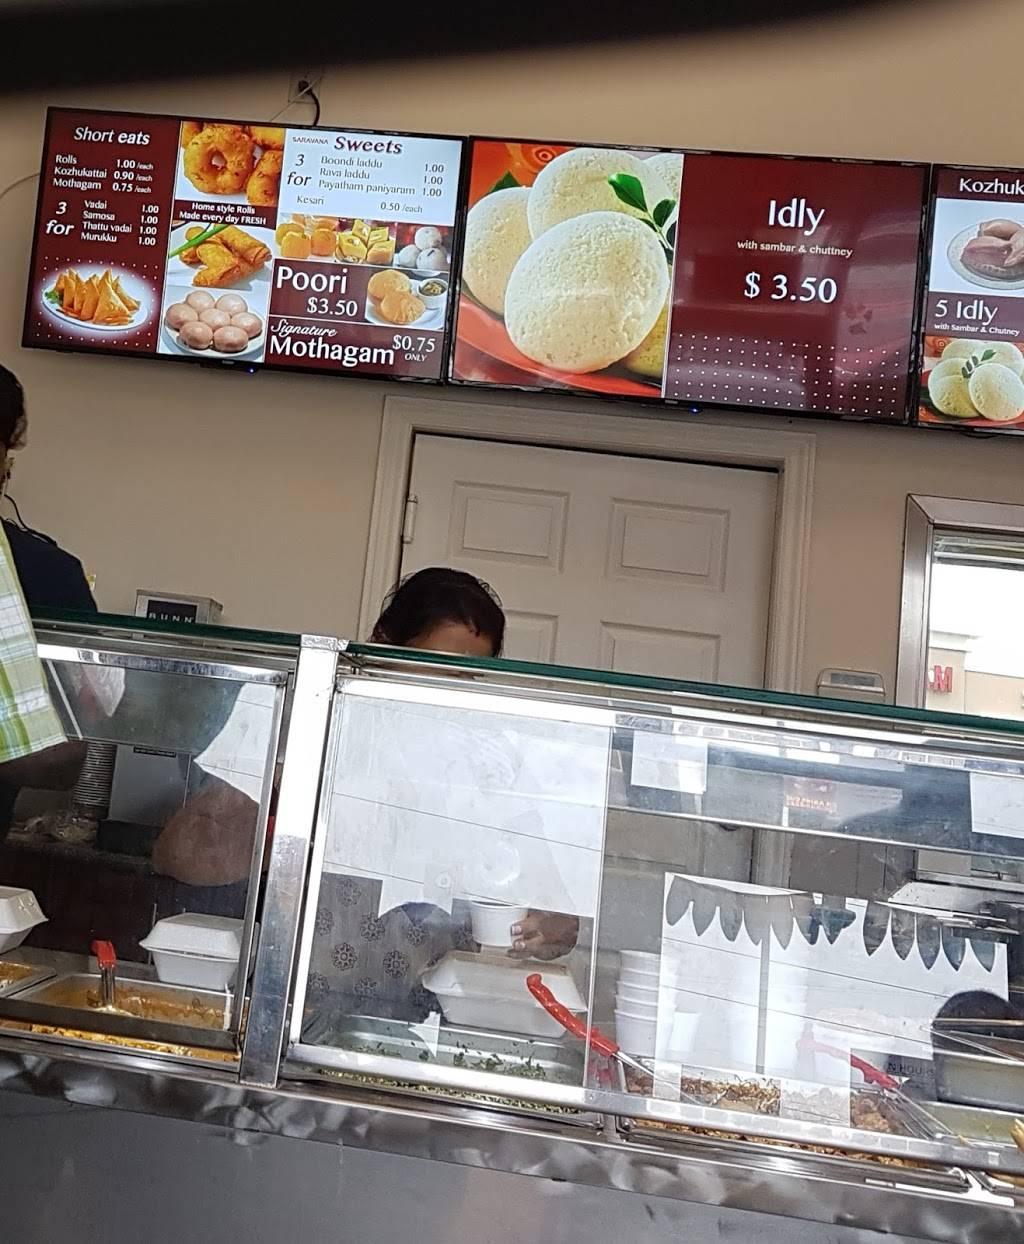 Saravana | restaurant | 2761 Markham Rd #28, Scarborough, ON M1X 0A4, Canada | 4165466037 OR +1 416-546-6037